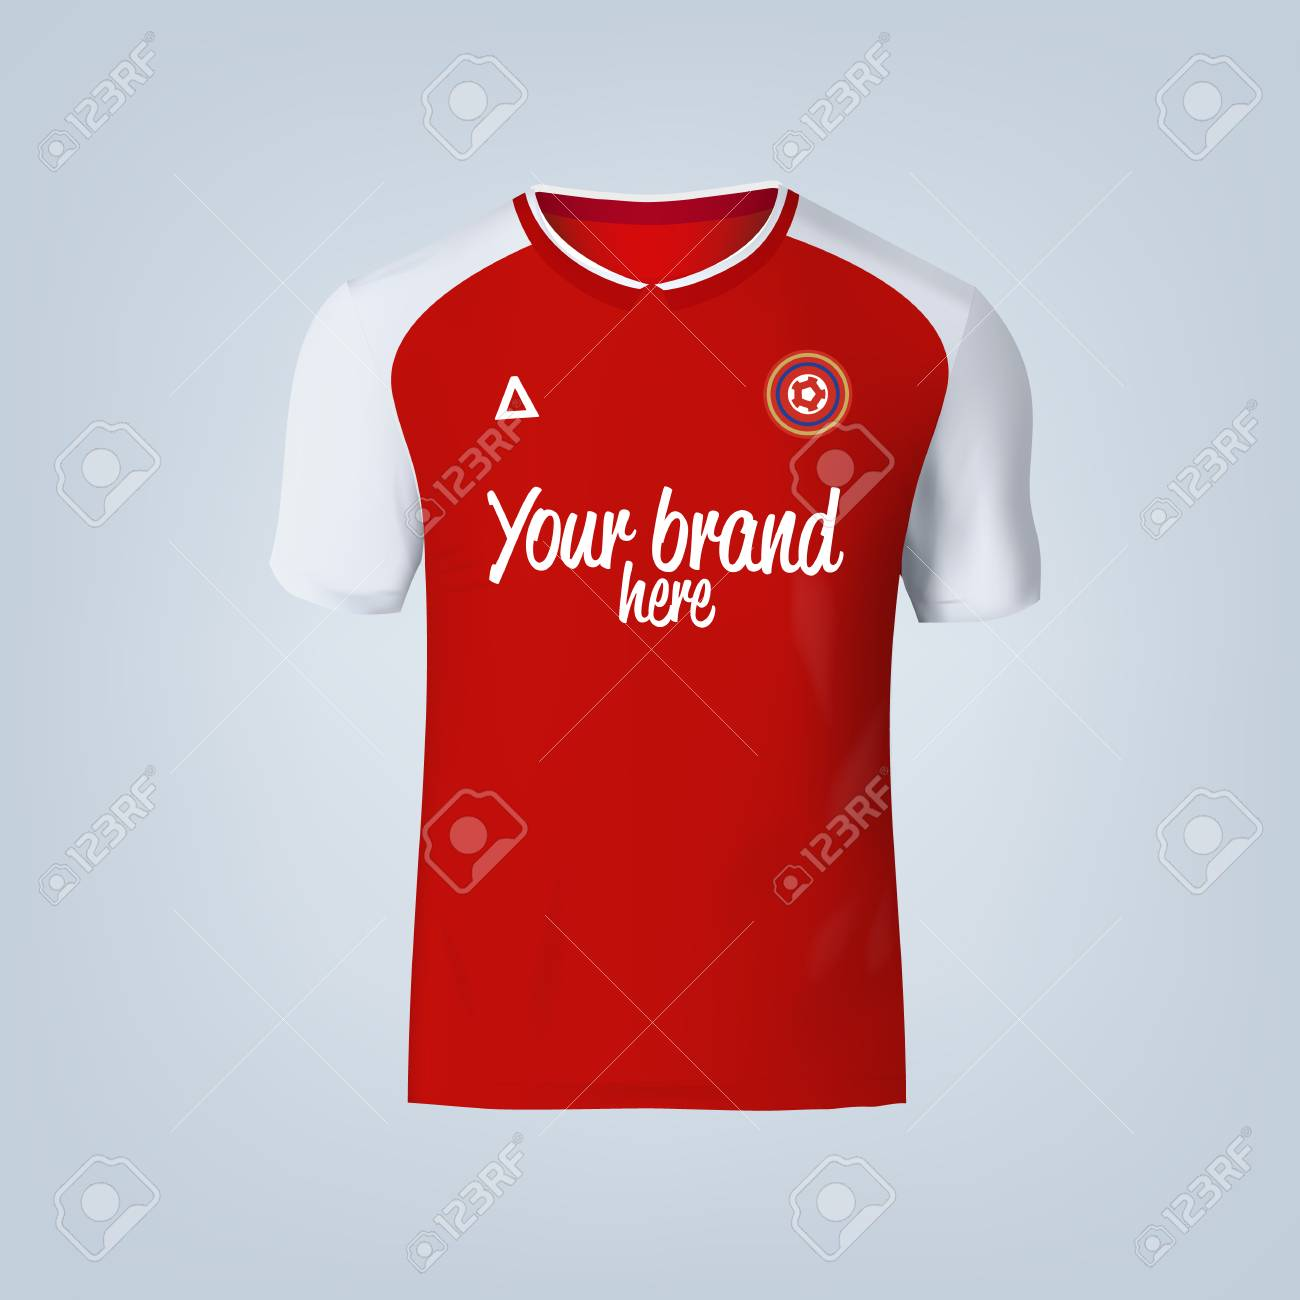 Vector illustration of football t-shirt template. - 84012301